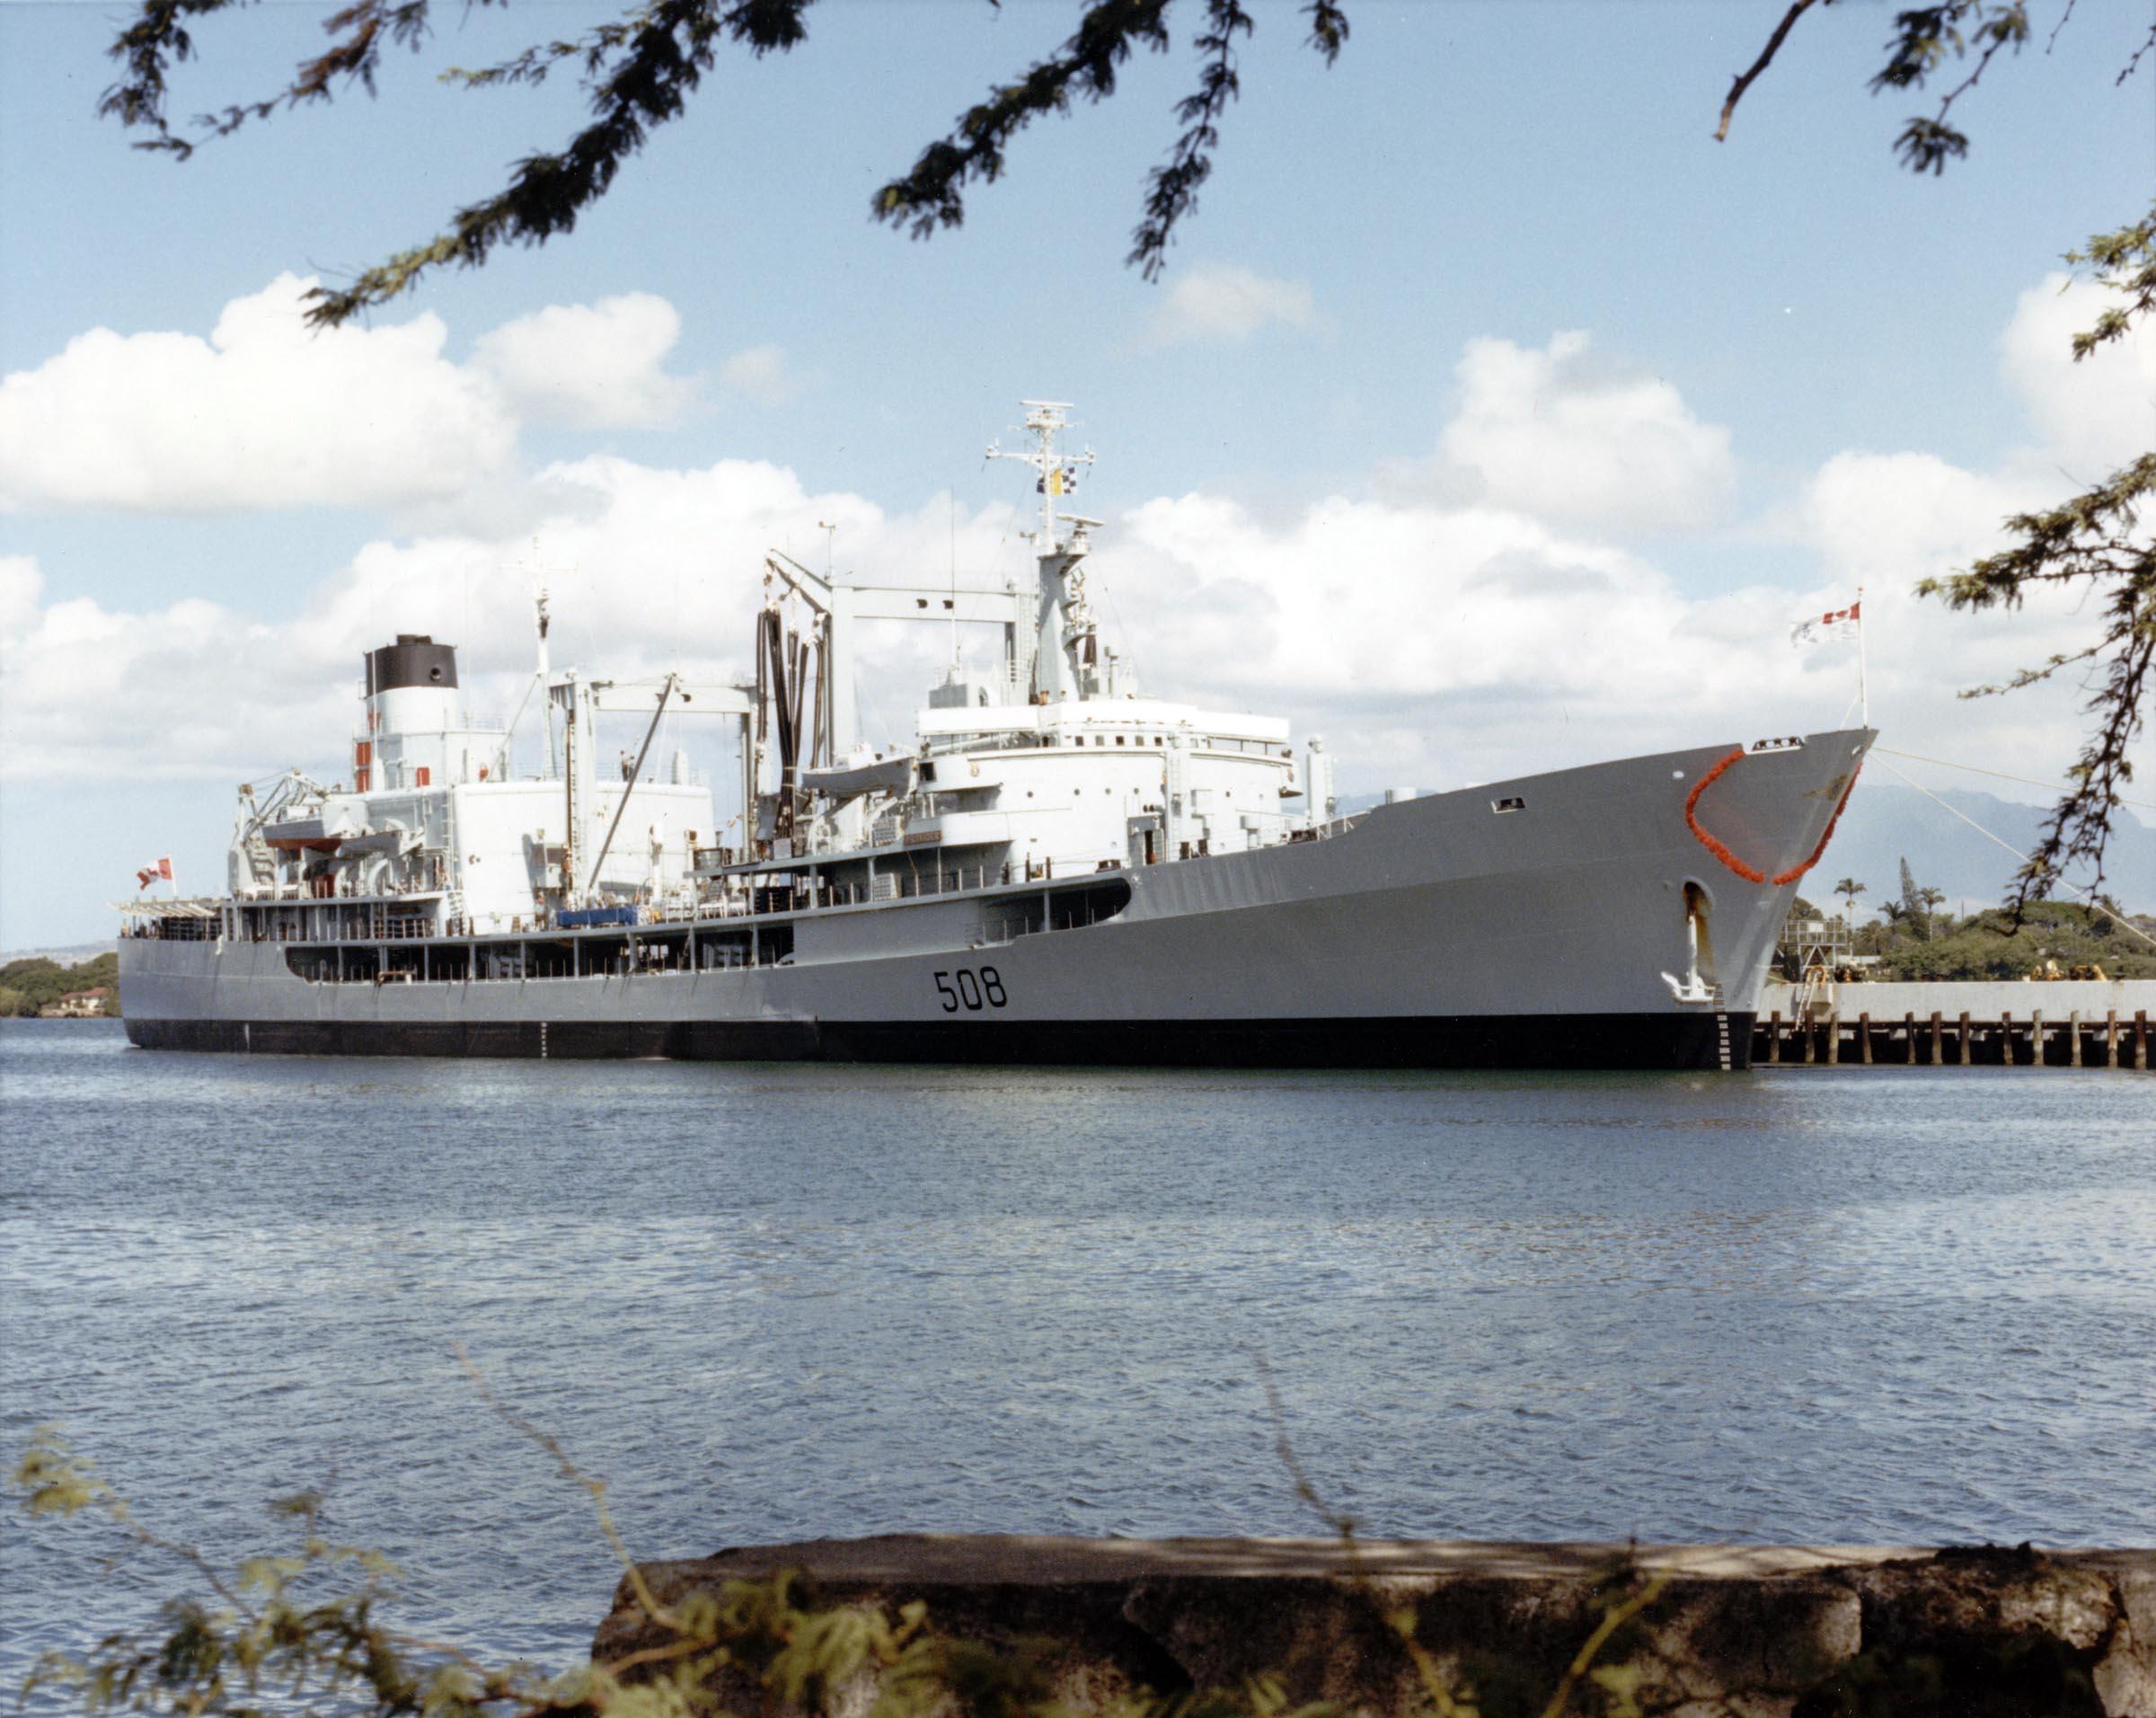 HMCS PROVIDER